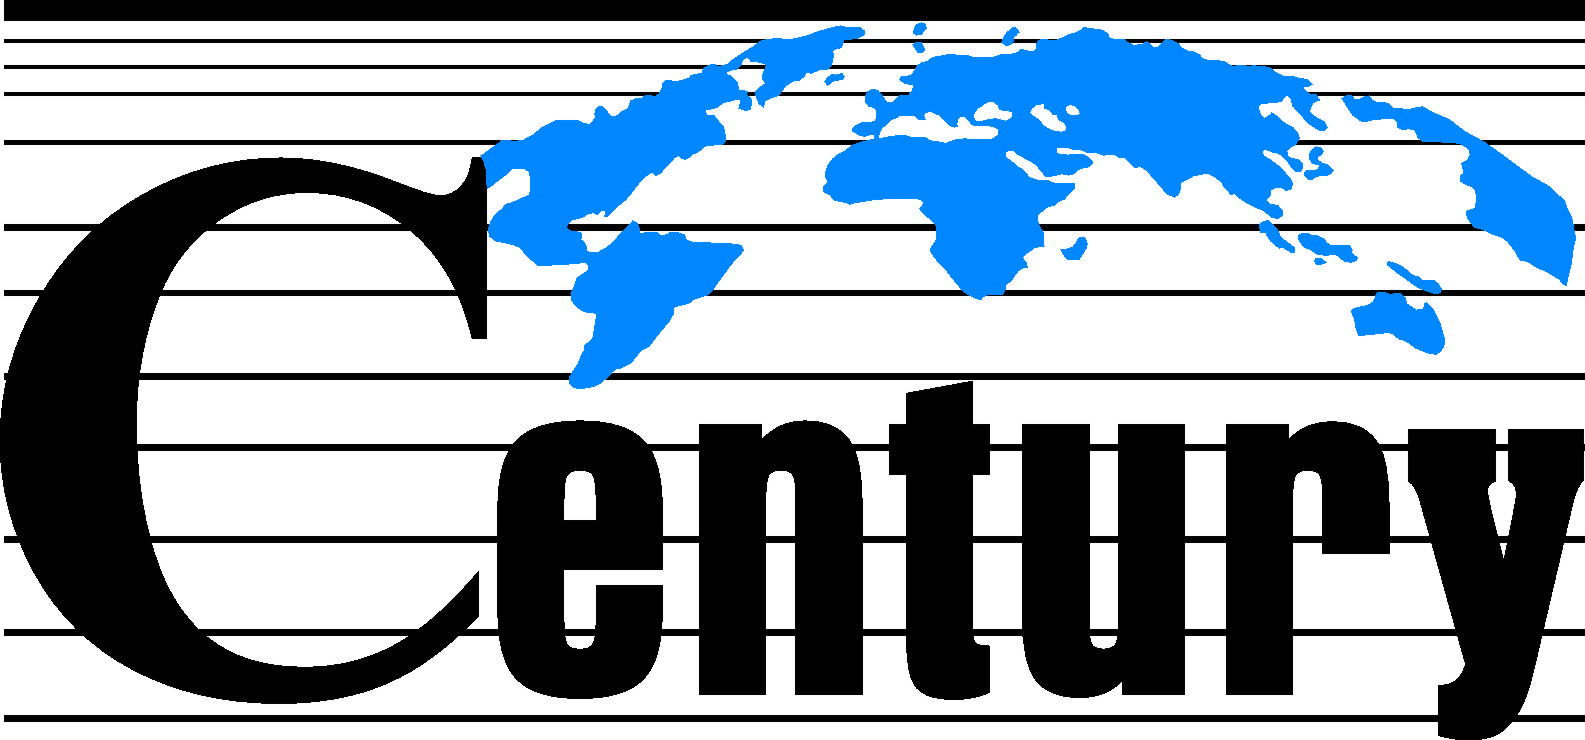 Century Pharmaceuticals Limited